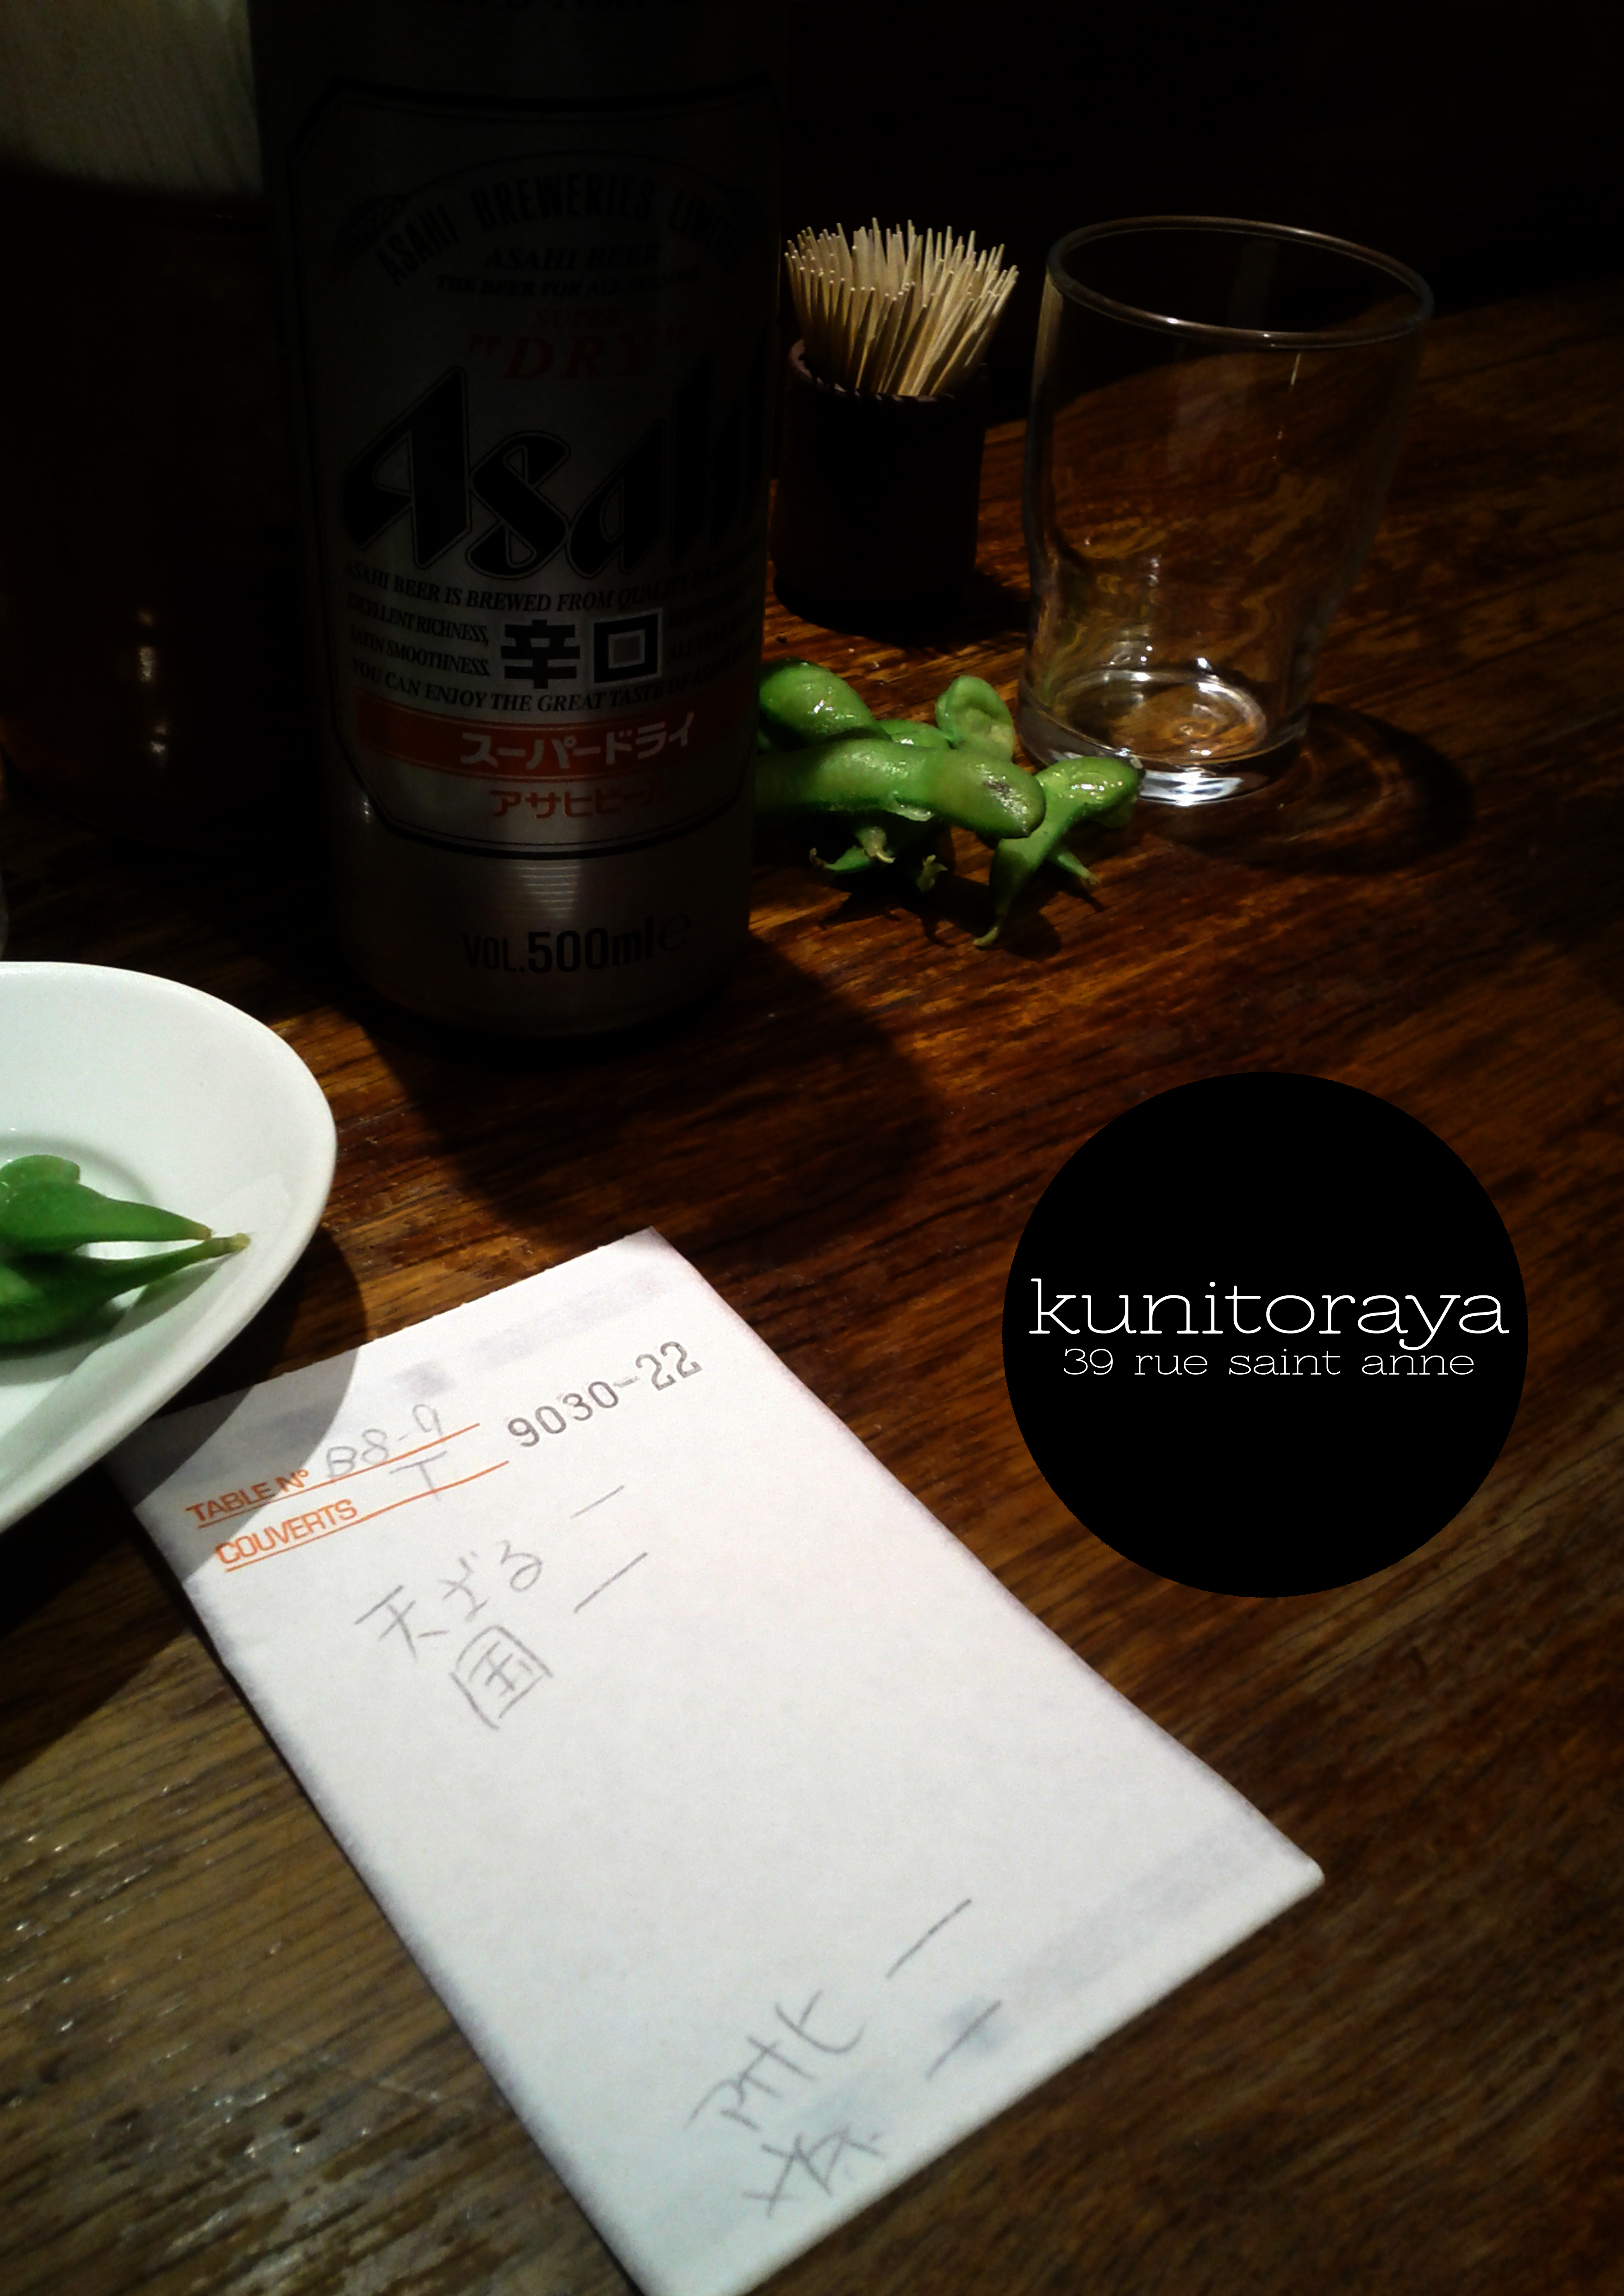 kunitoraya-japonais-paris-udon-by-le-polyedre_1